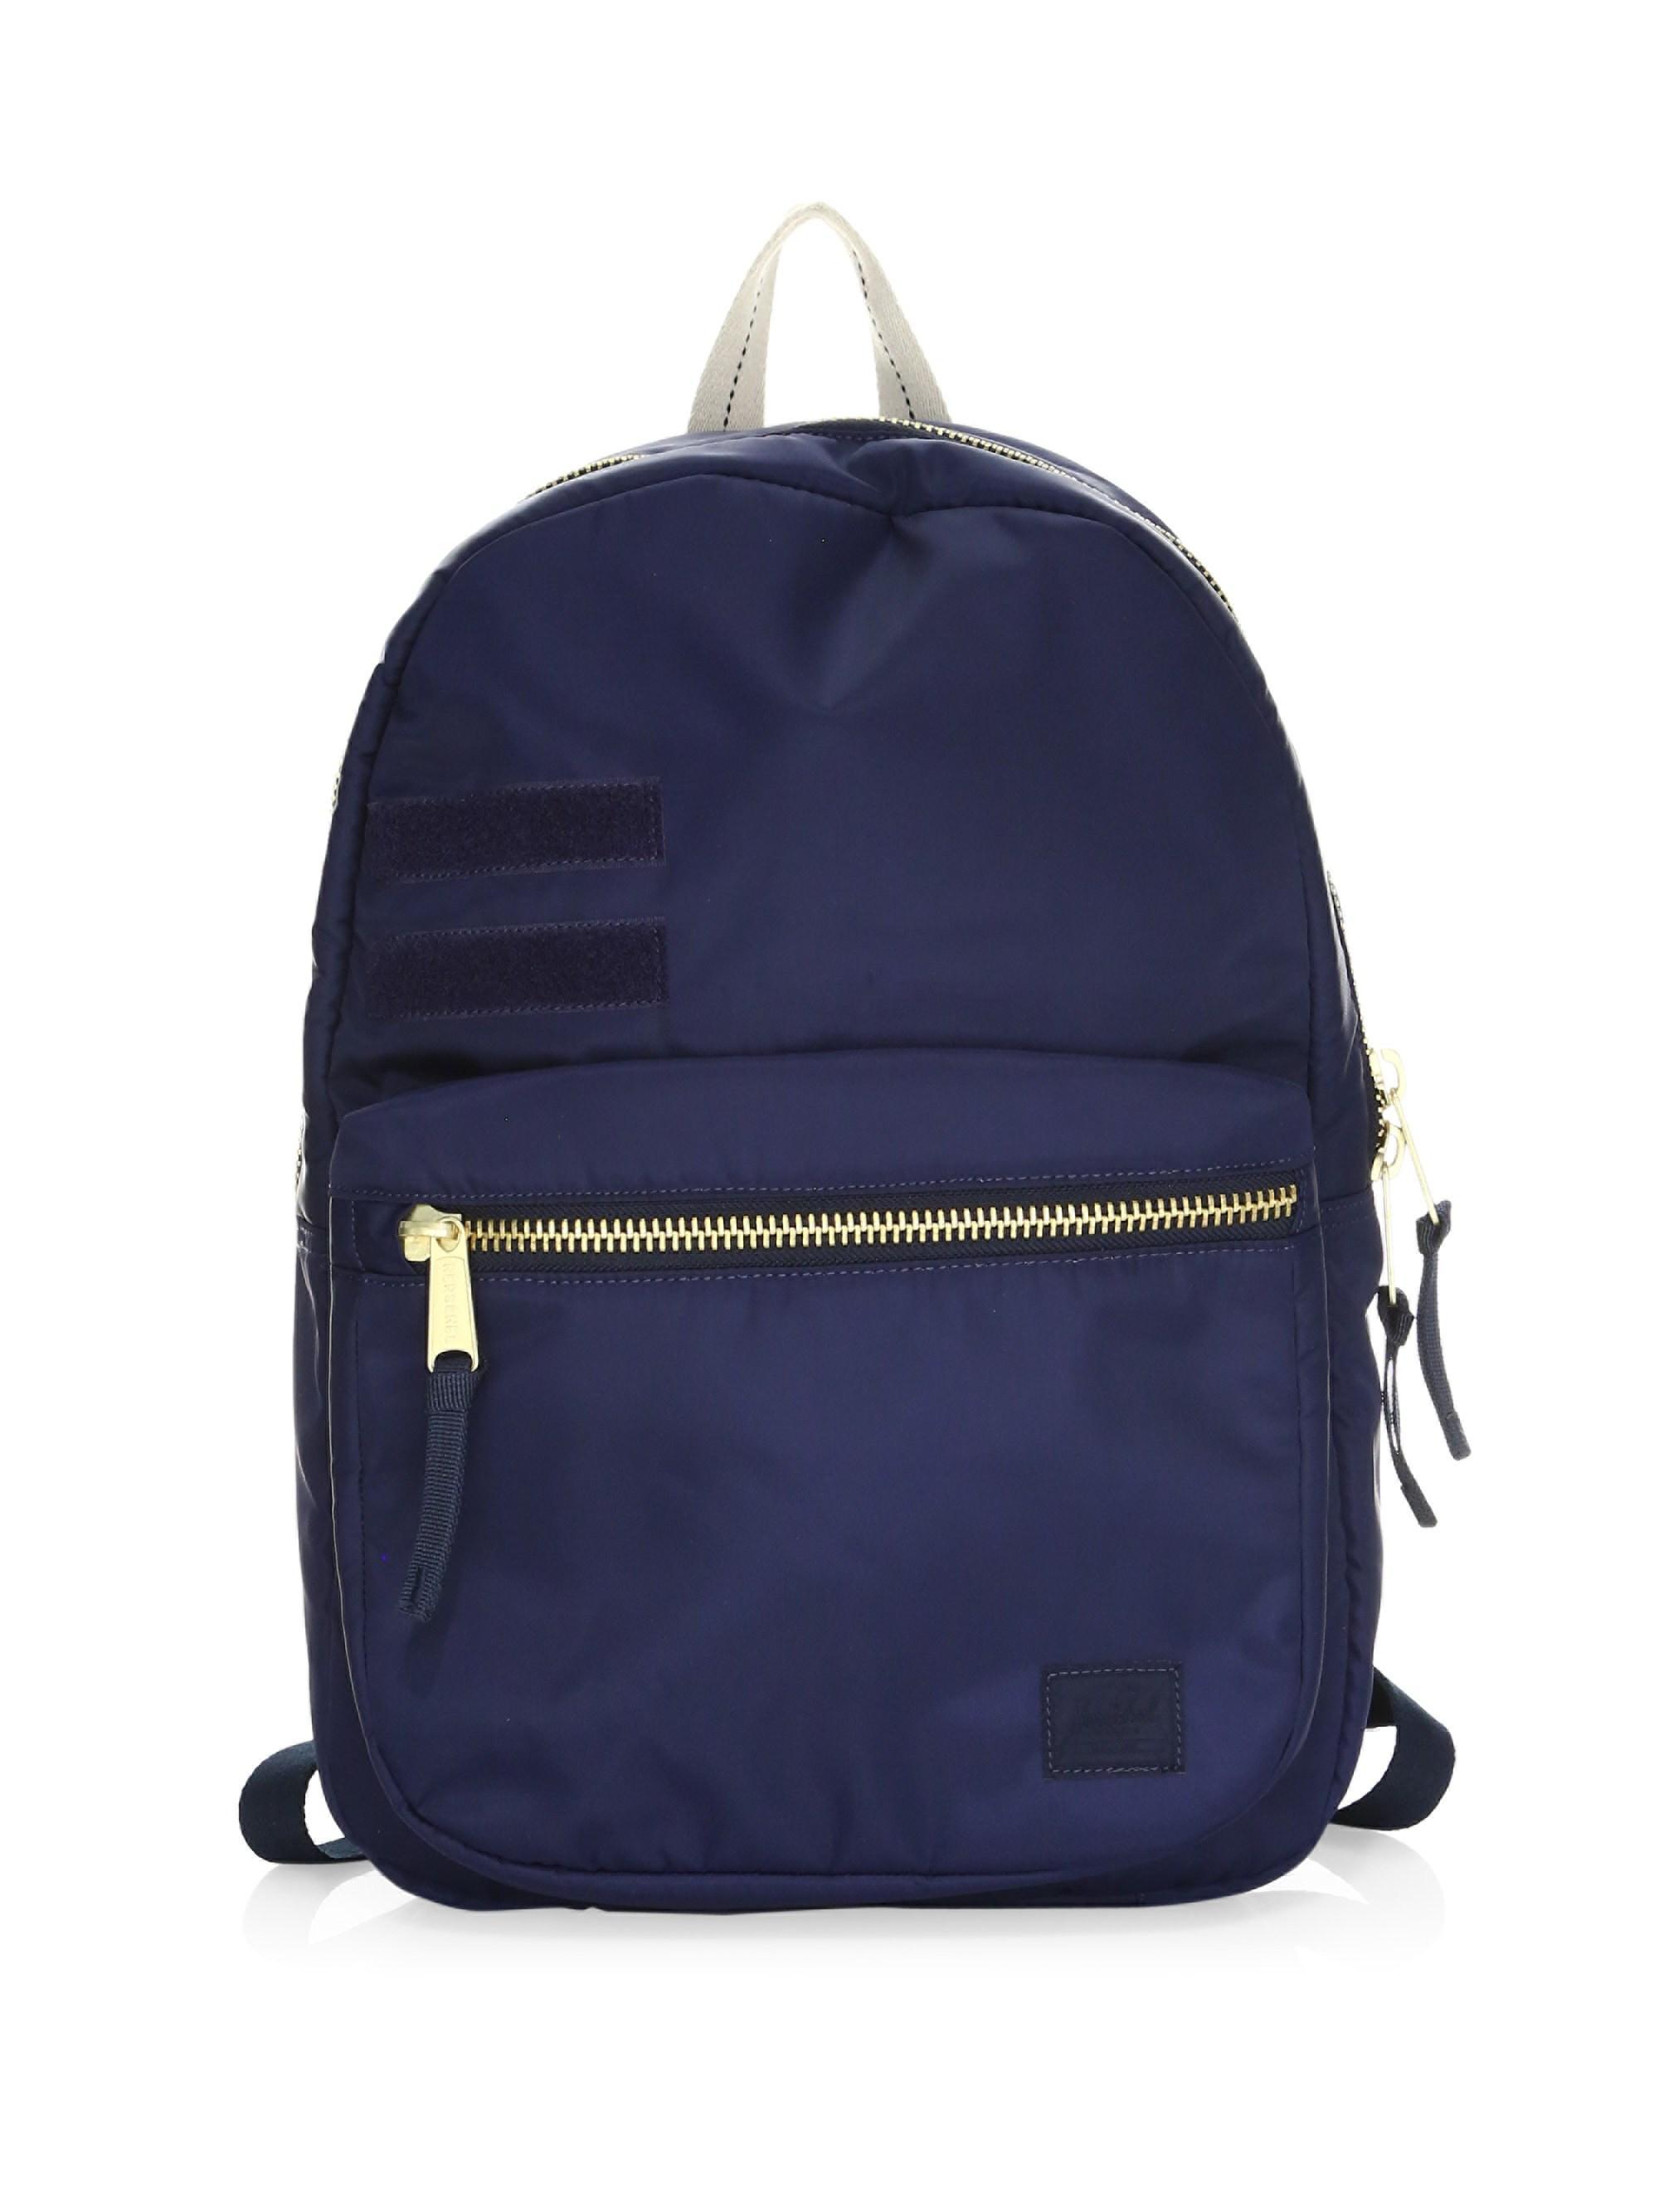 Lyst - Herschel Supply Co. Lawson Surplus Backpack in Blue for Men c890bb4e18